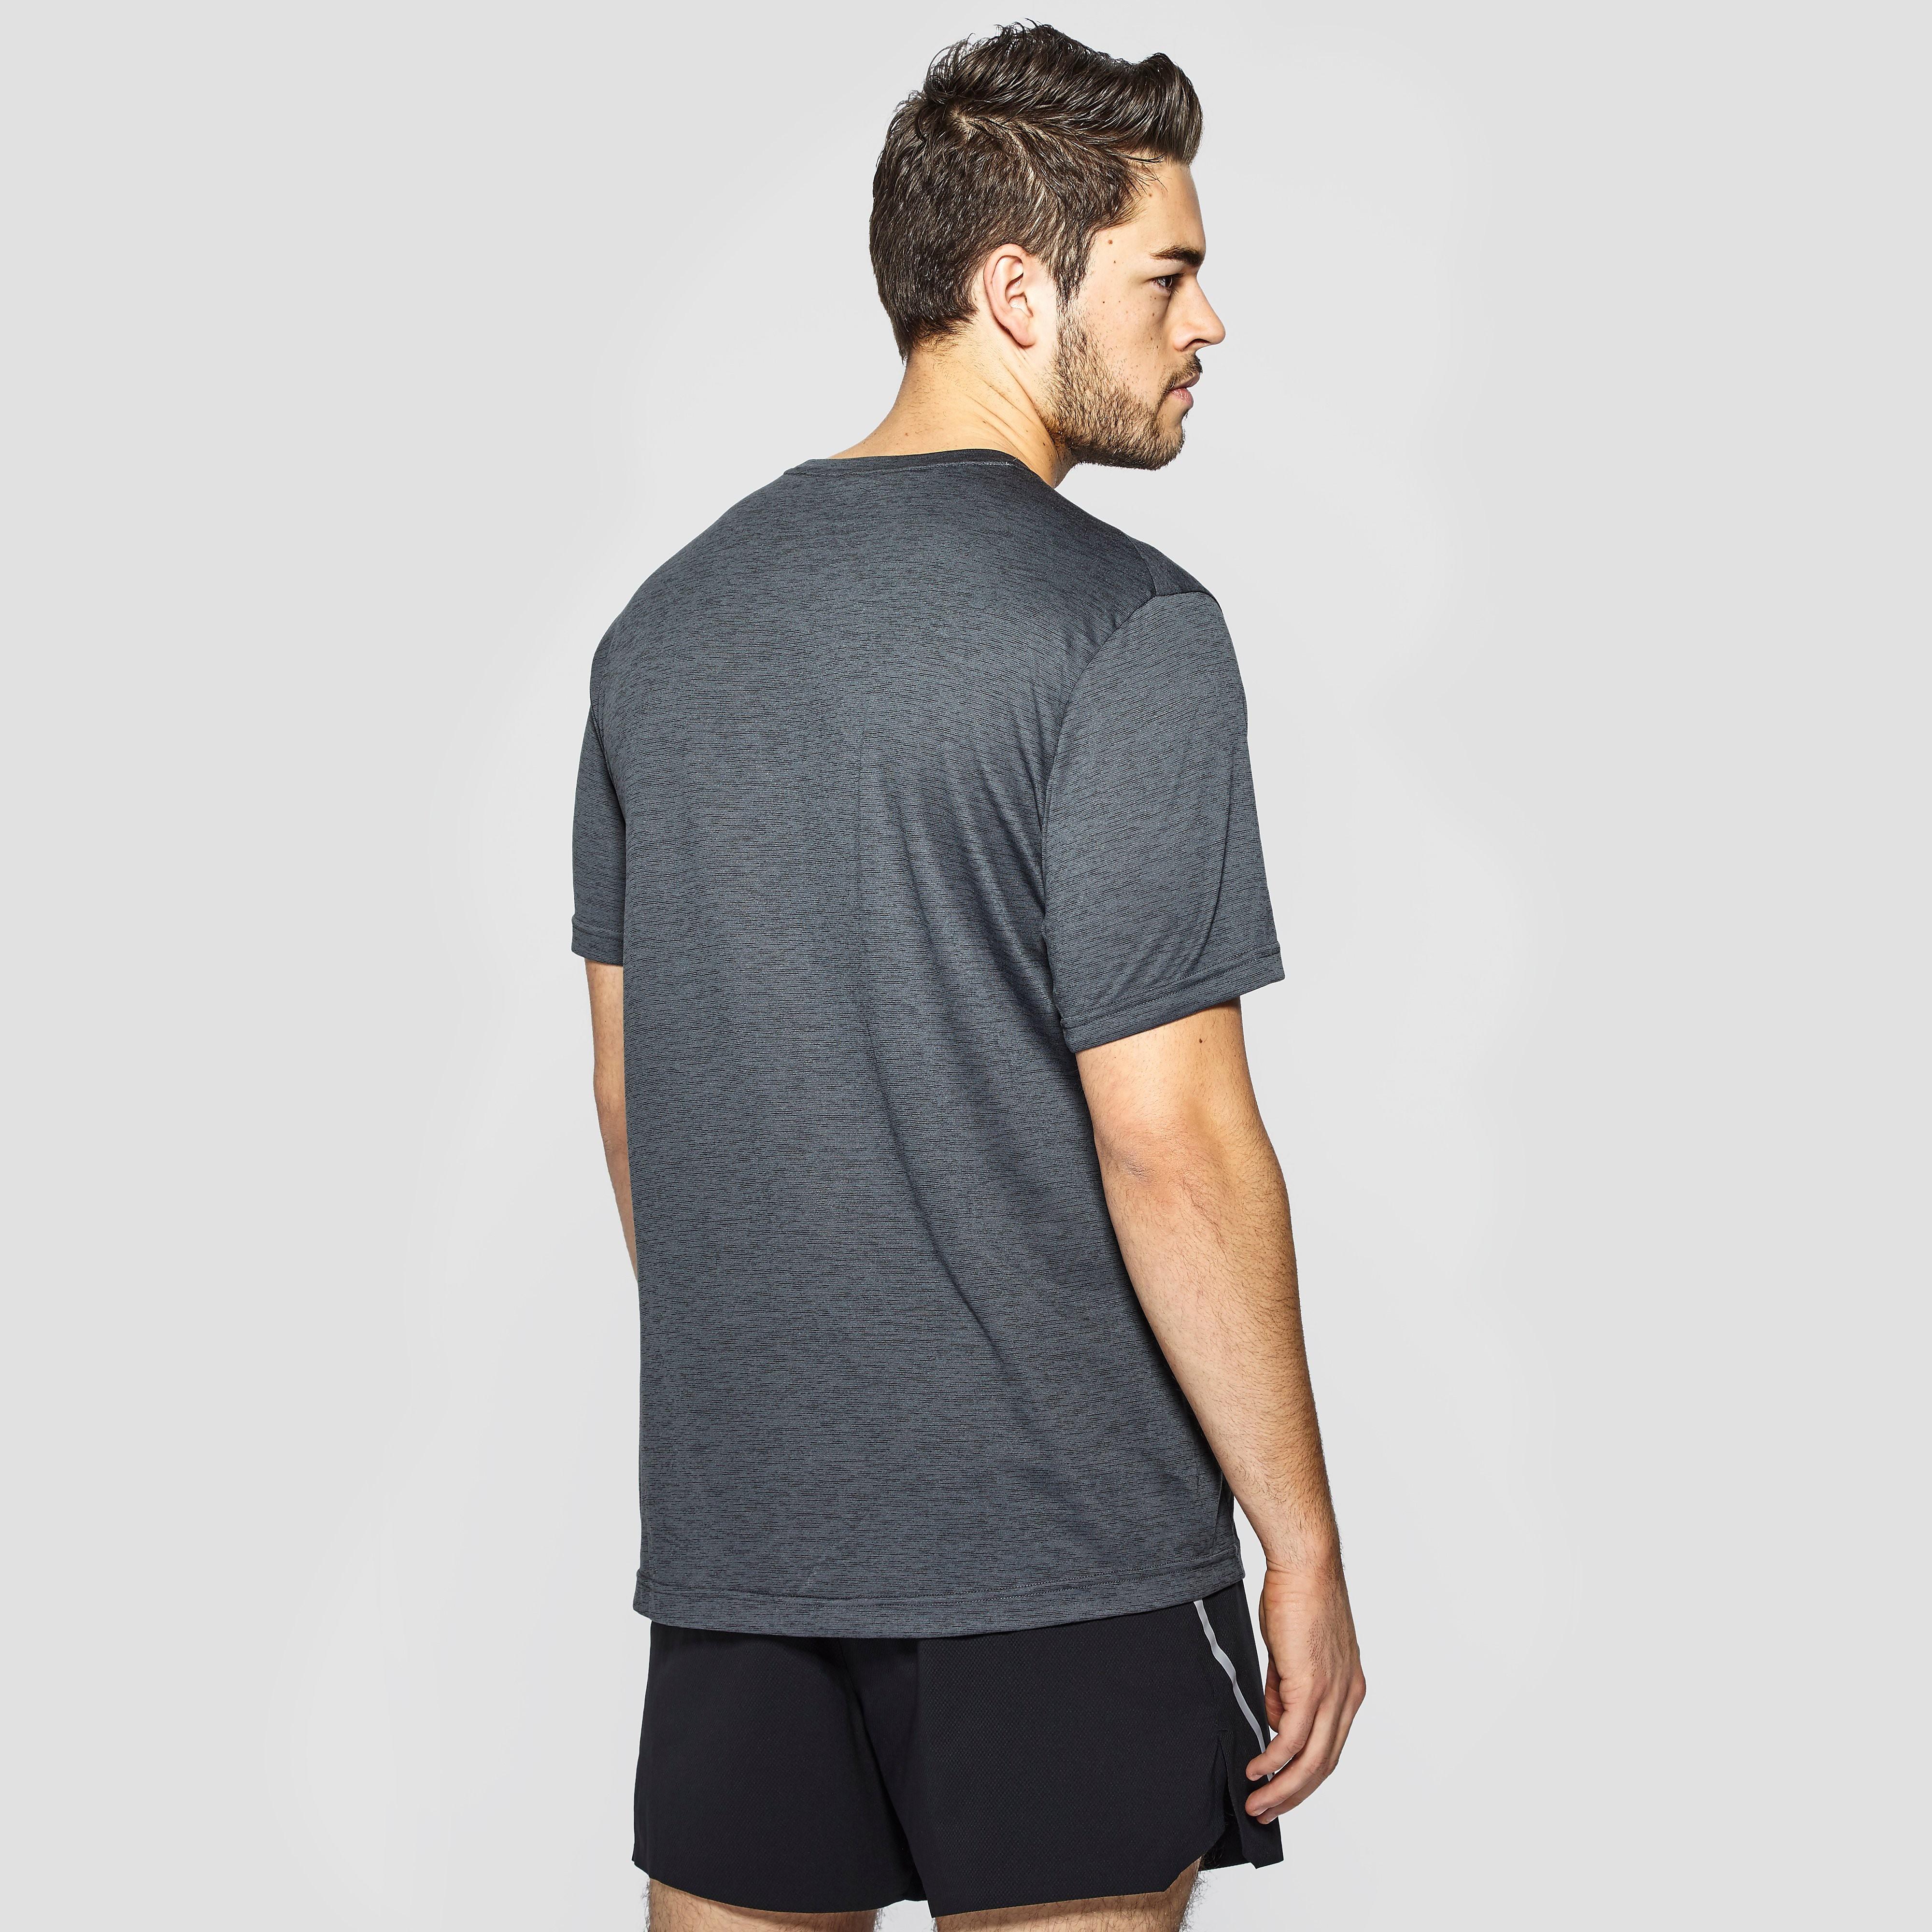 Nike Nike Dry Training Top